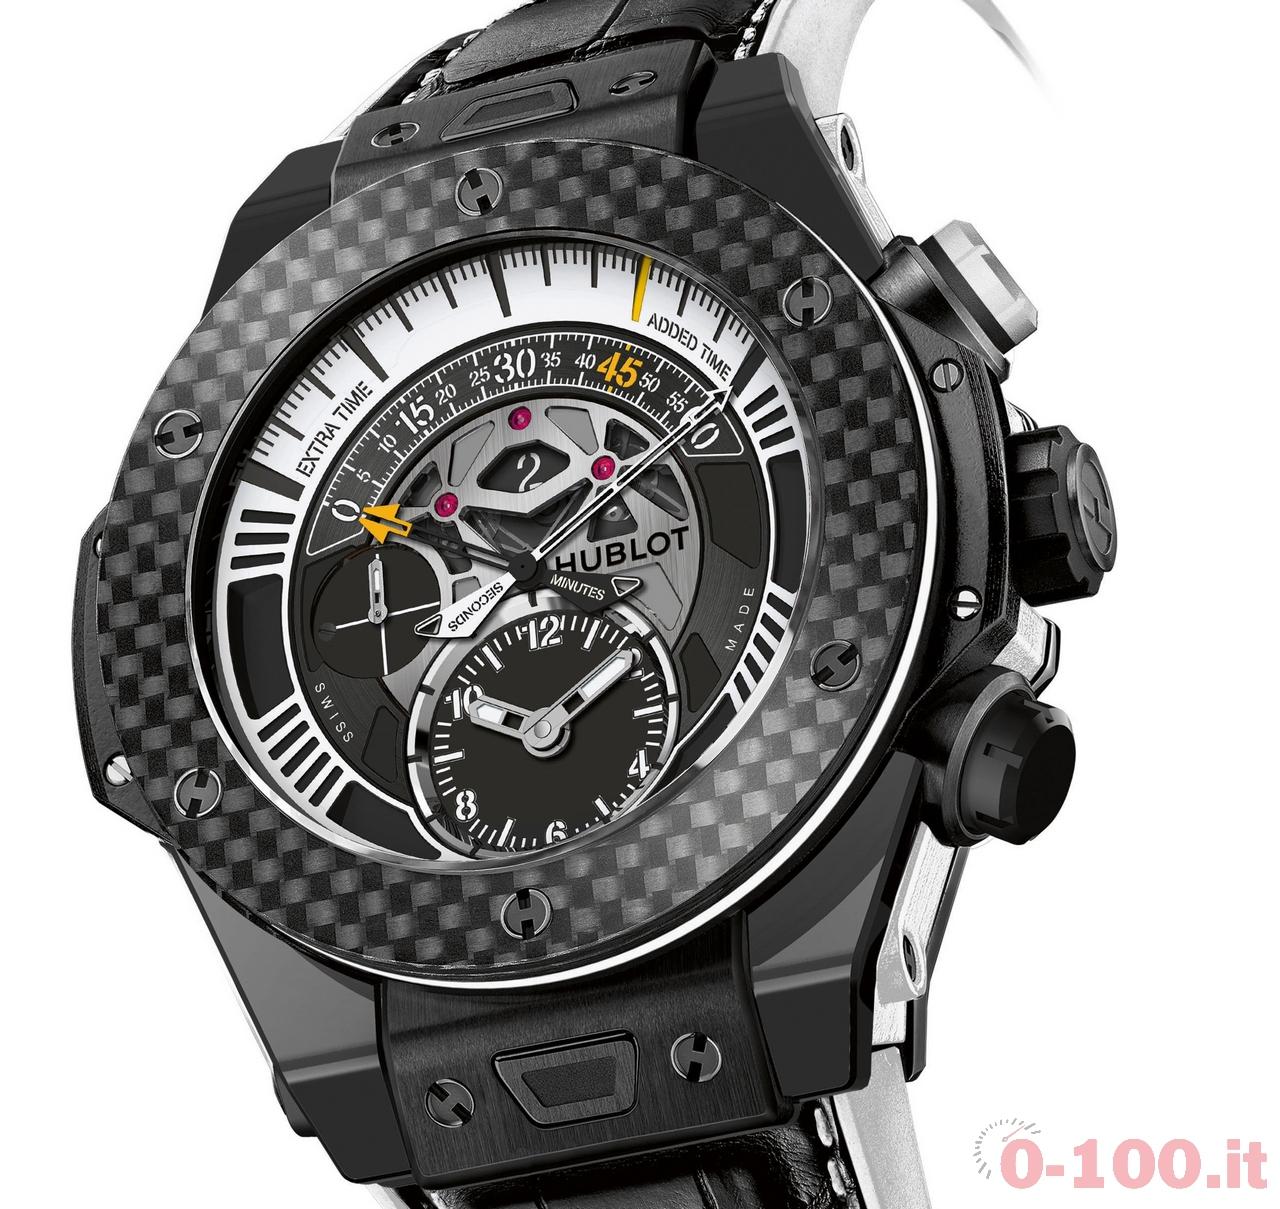 hublot-big-bang-unico-bi-retrograde-juventus-prezzo-price_0-1001